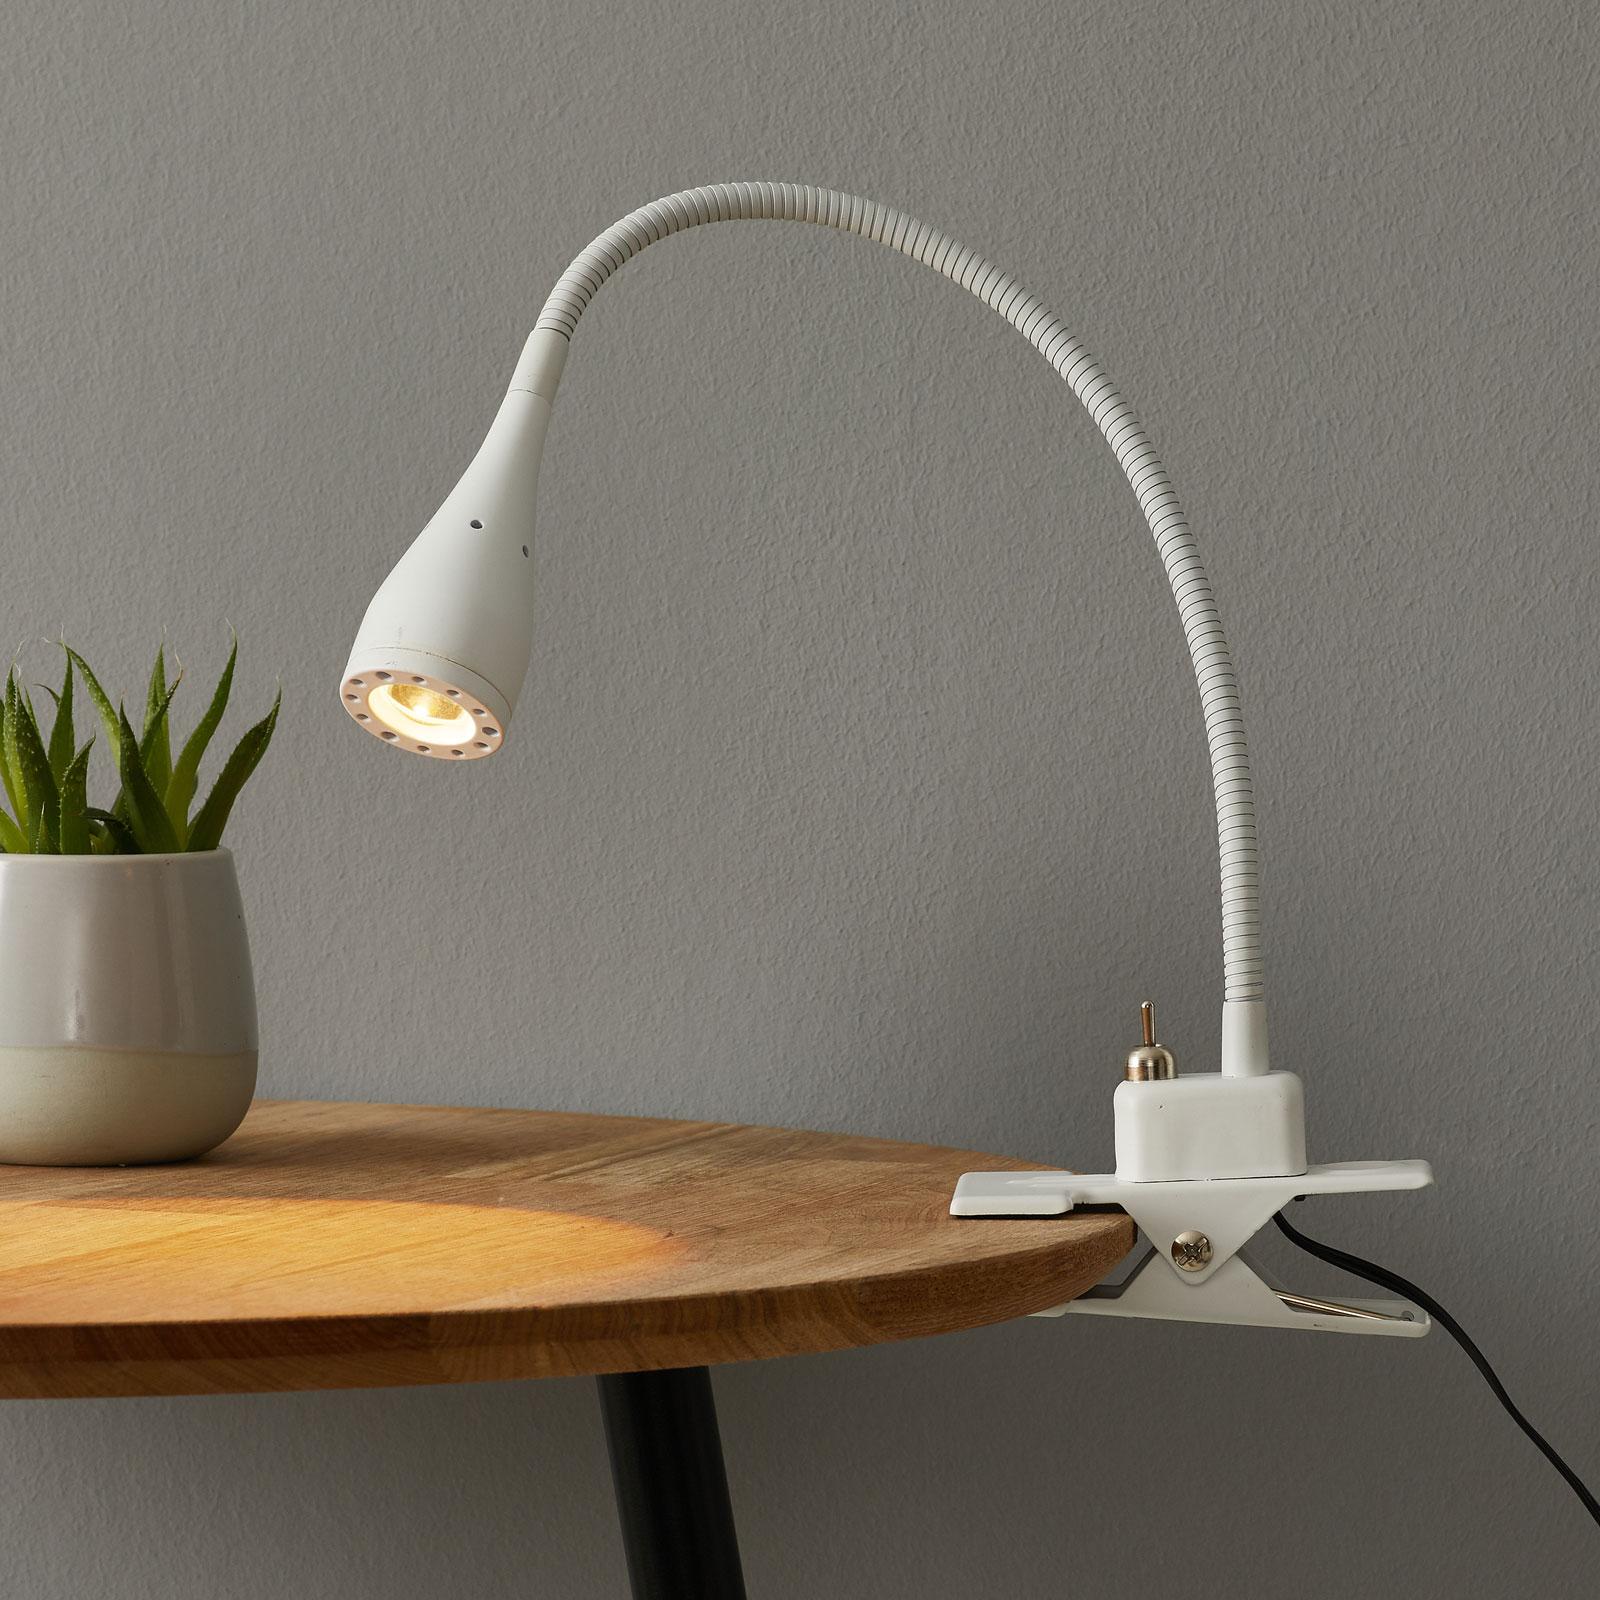 Fleksibel Mento Led Lampe I Hvitt Med Klemme Lampegiganten No